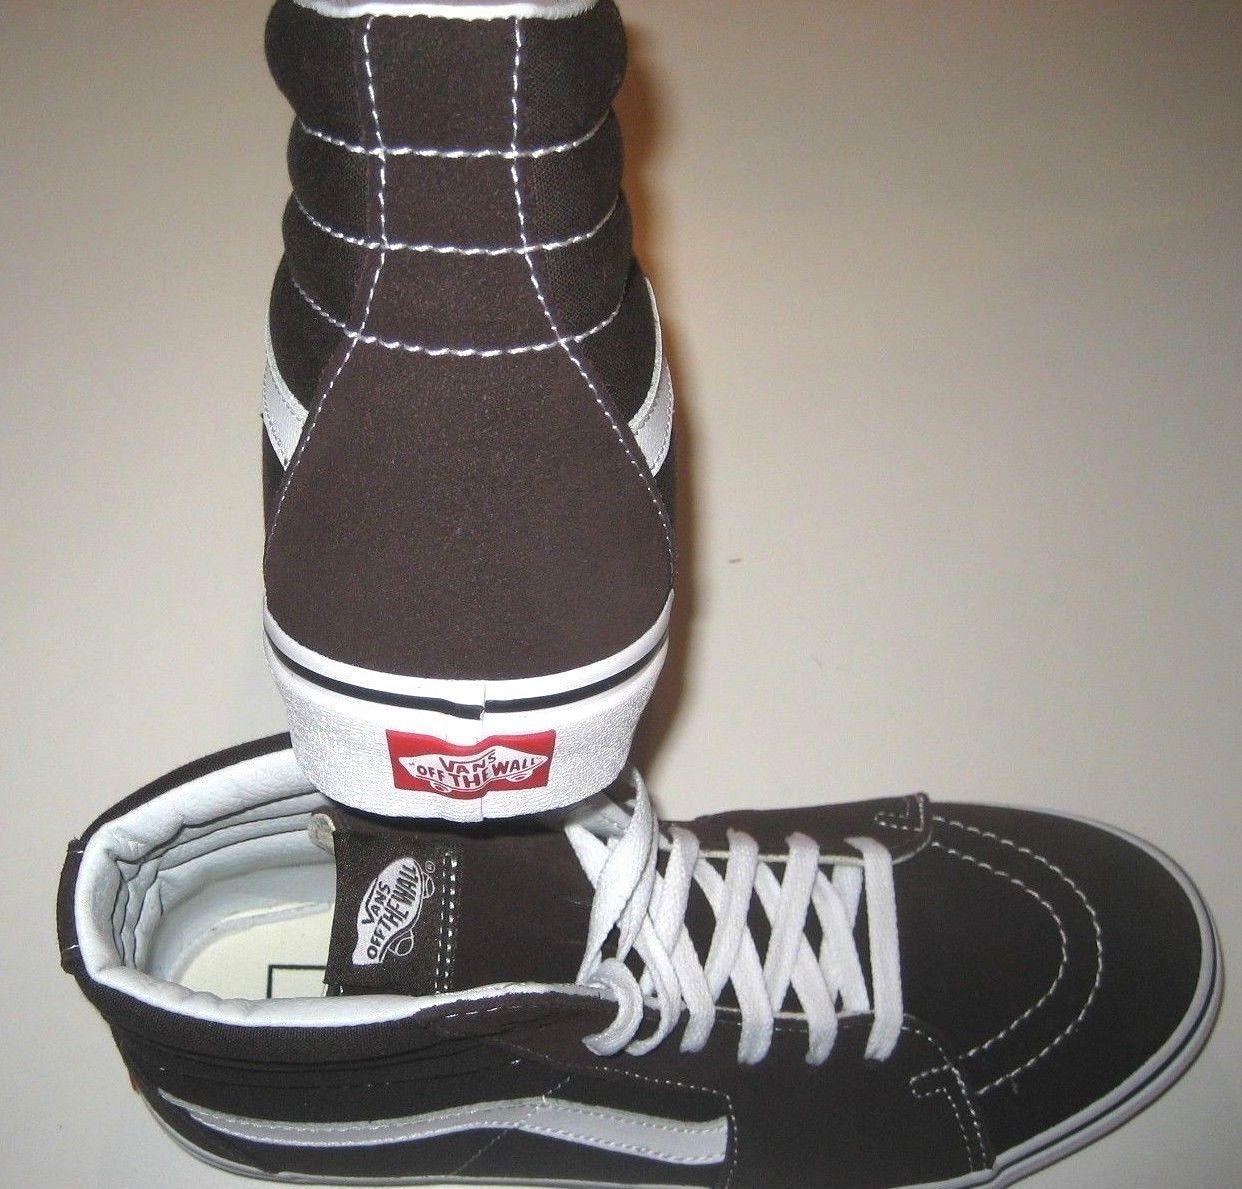 Vans Mens Sk8-Hi Chocolate Torte True White Canvas Suede Skate shoes Size 9 NWT image 4